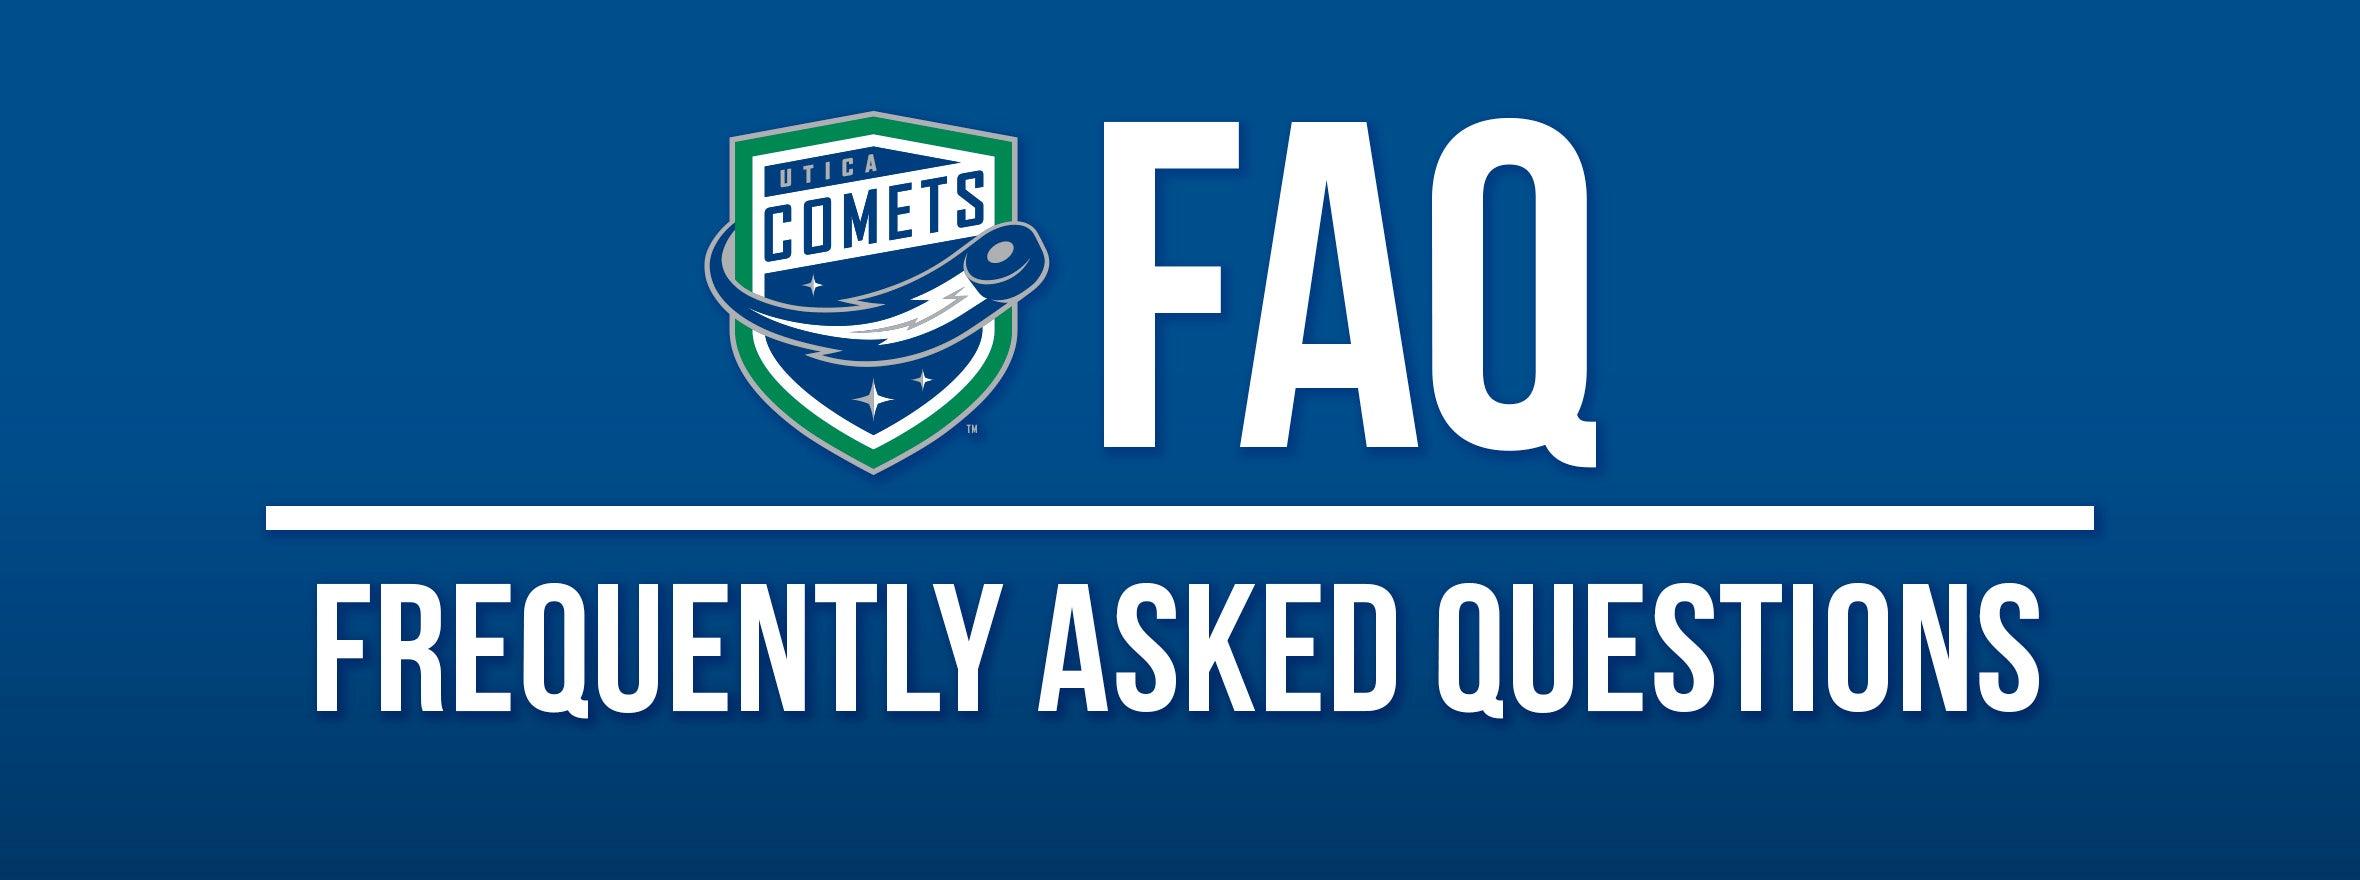 COMETS FAQ